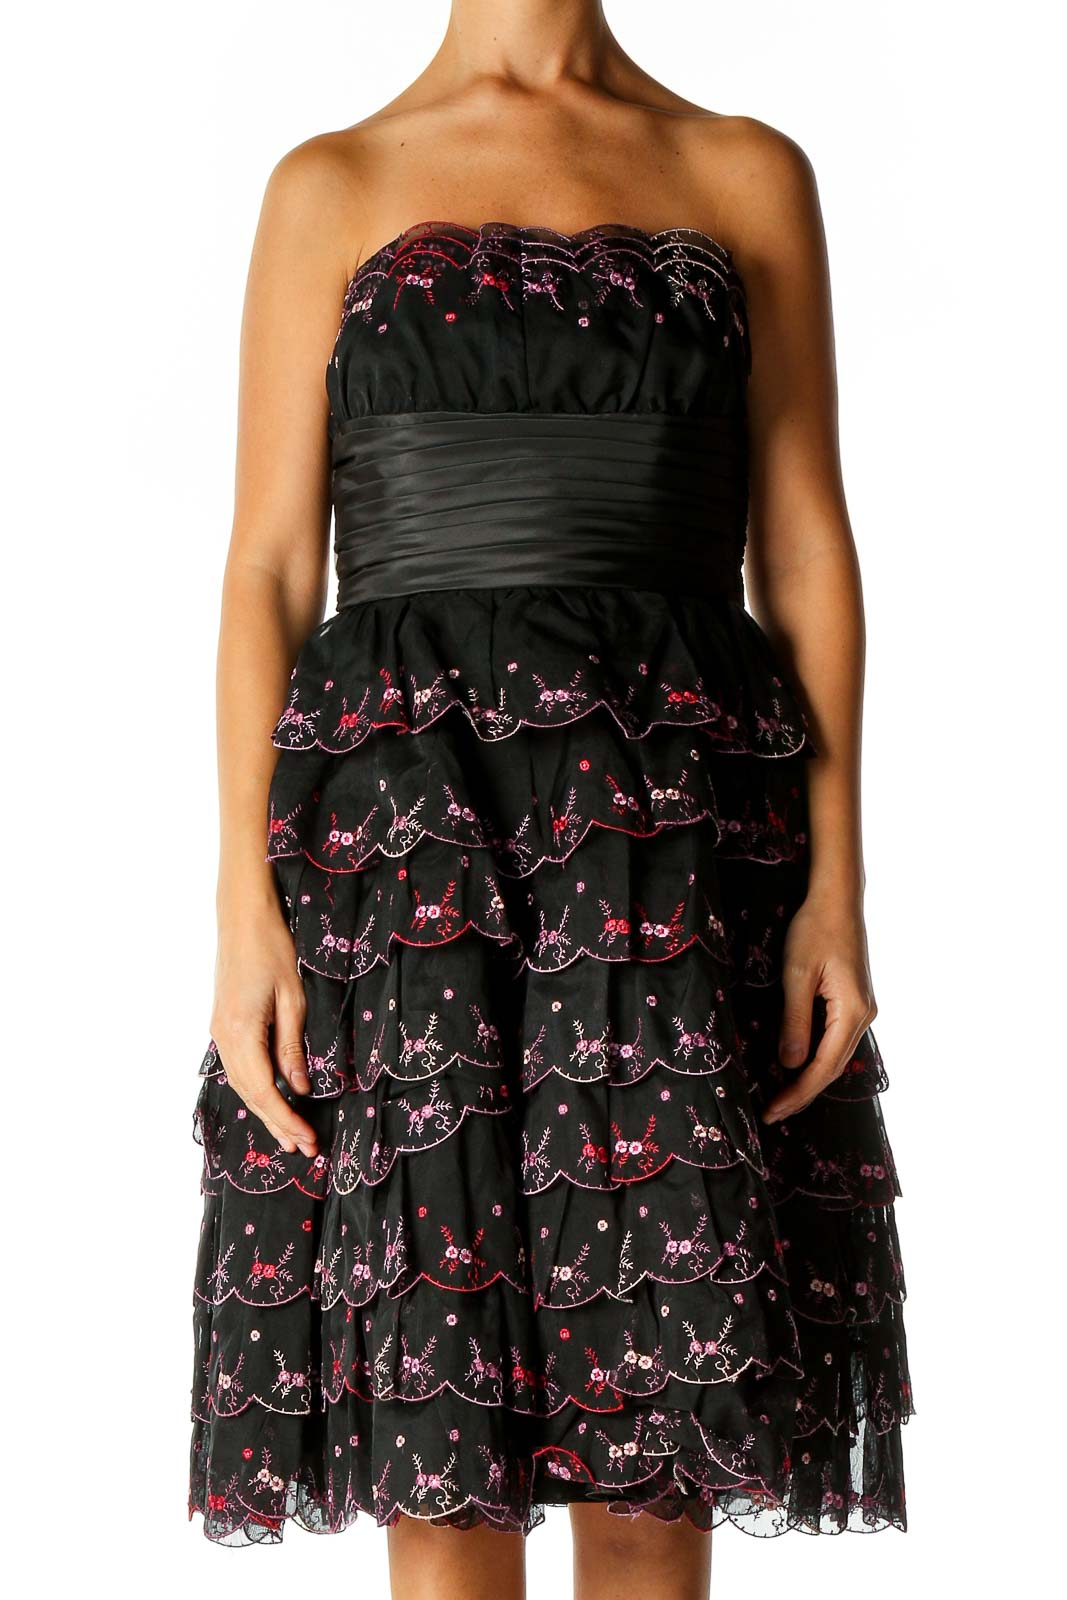 Black Textured Punk Fit & Flare Dress Front